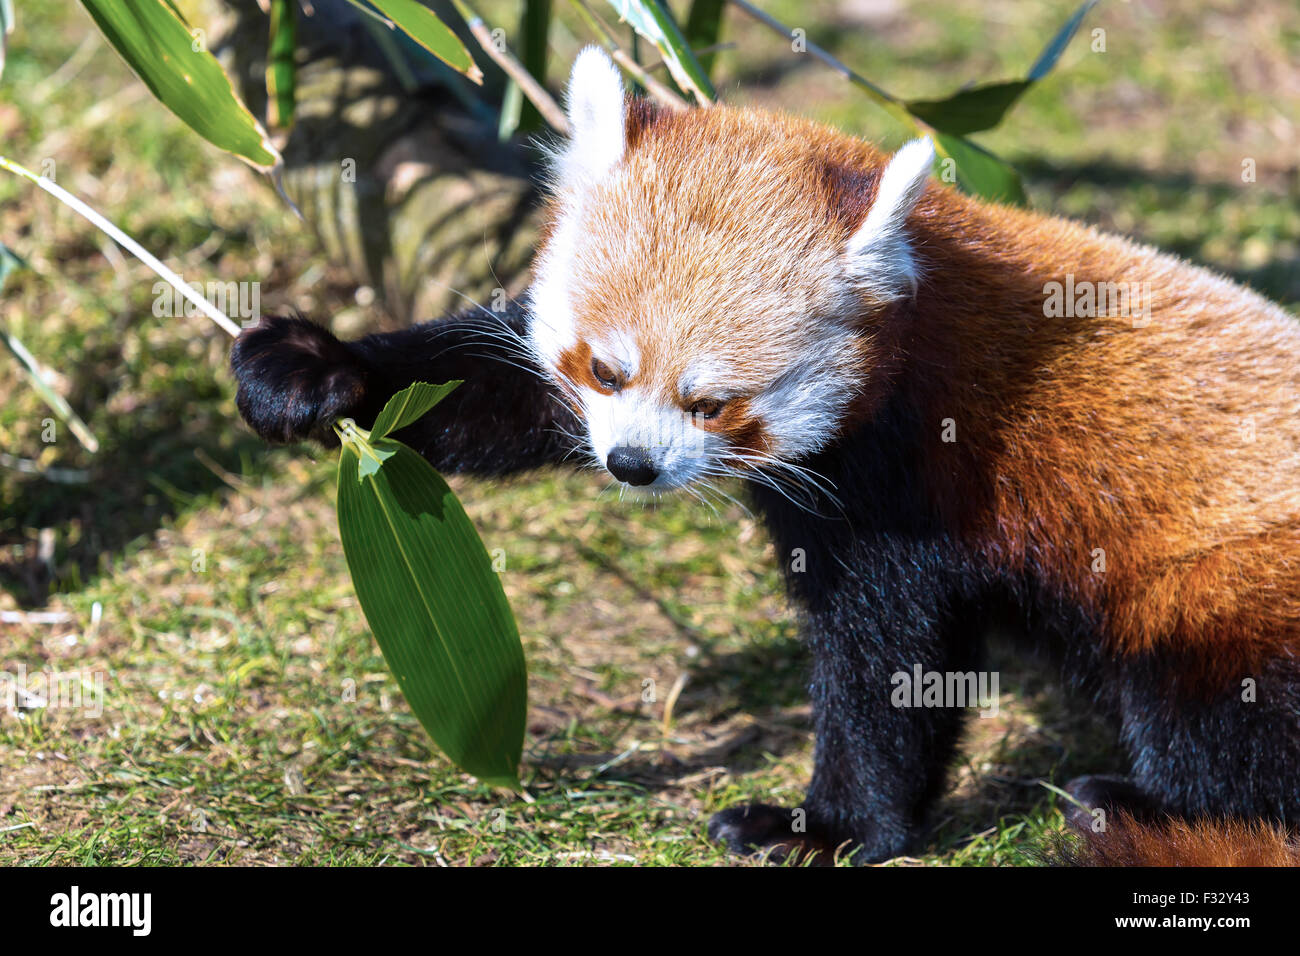 Roter Panda: sehr niedliche rote Panda Essen grüne Blätter. Stockbild